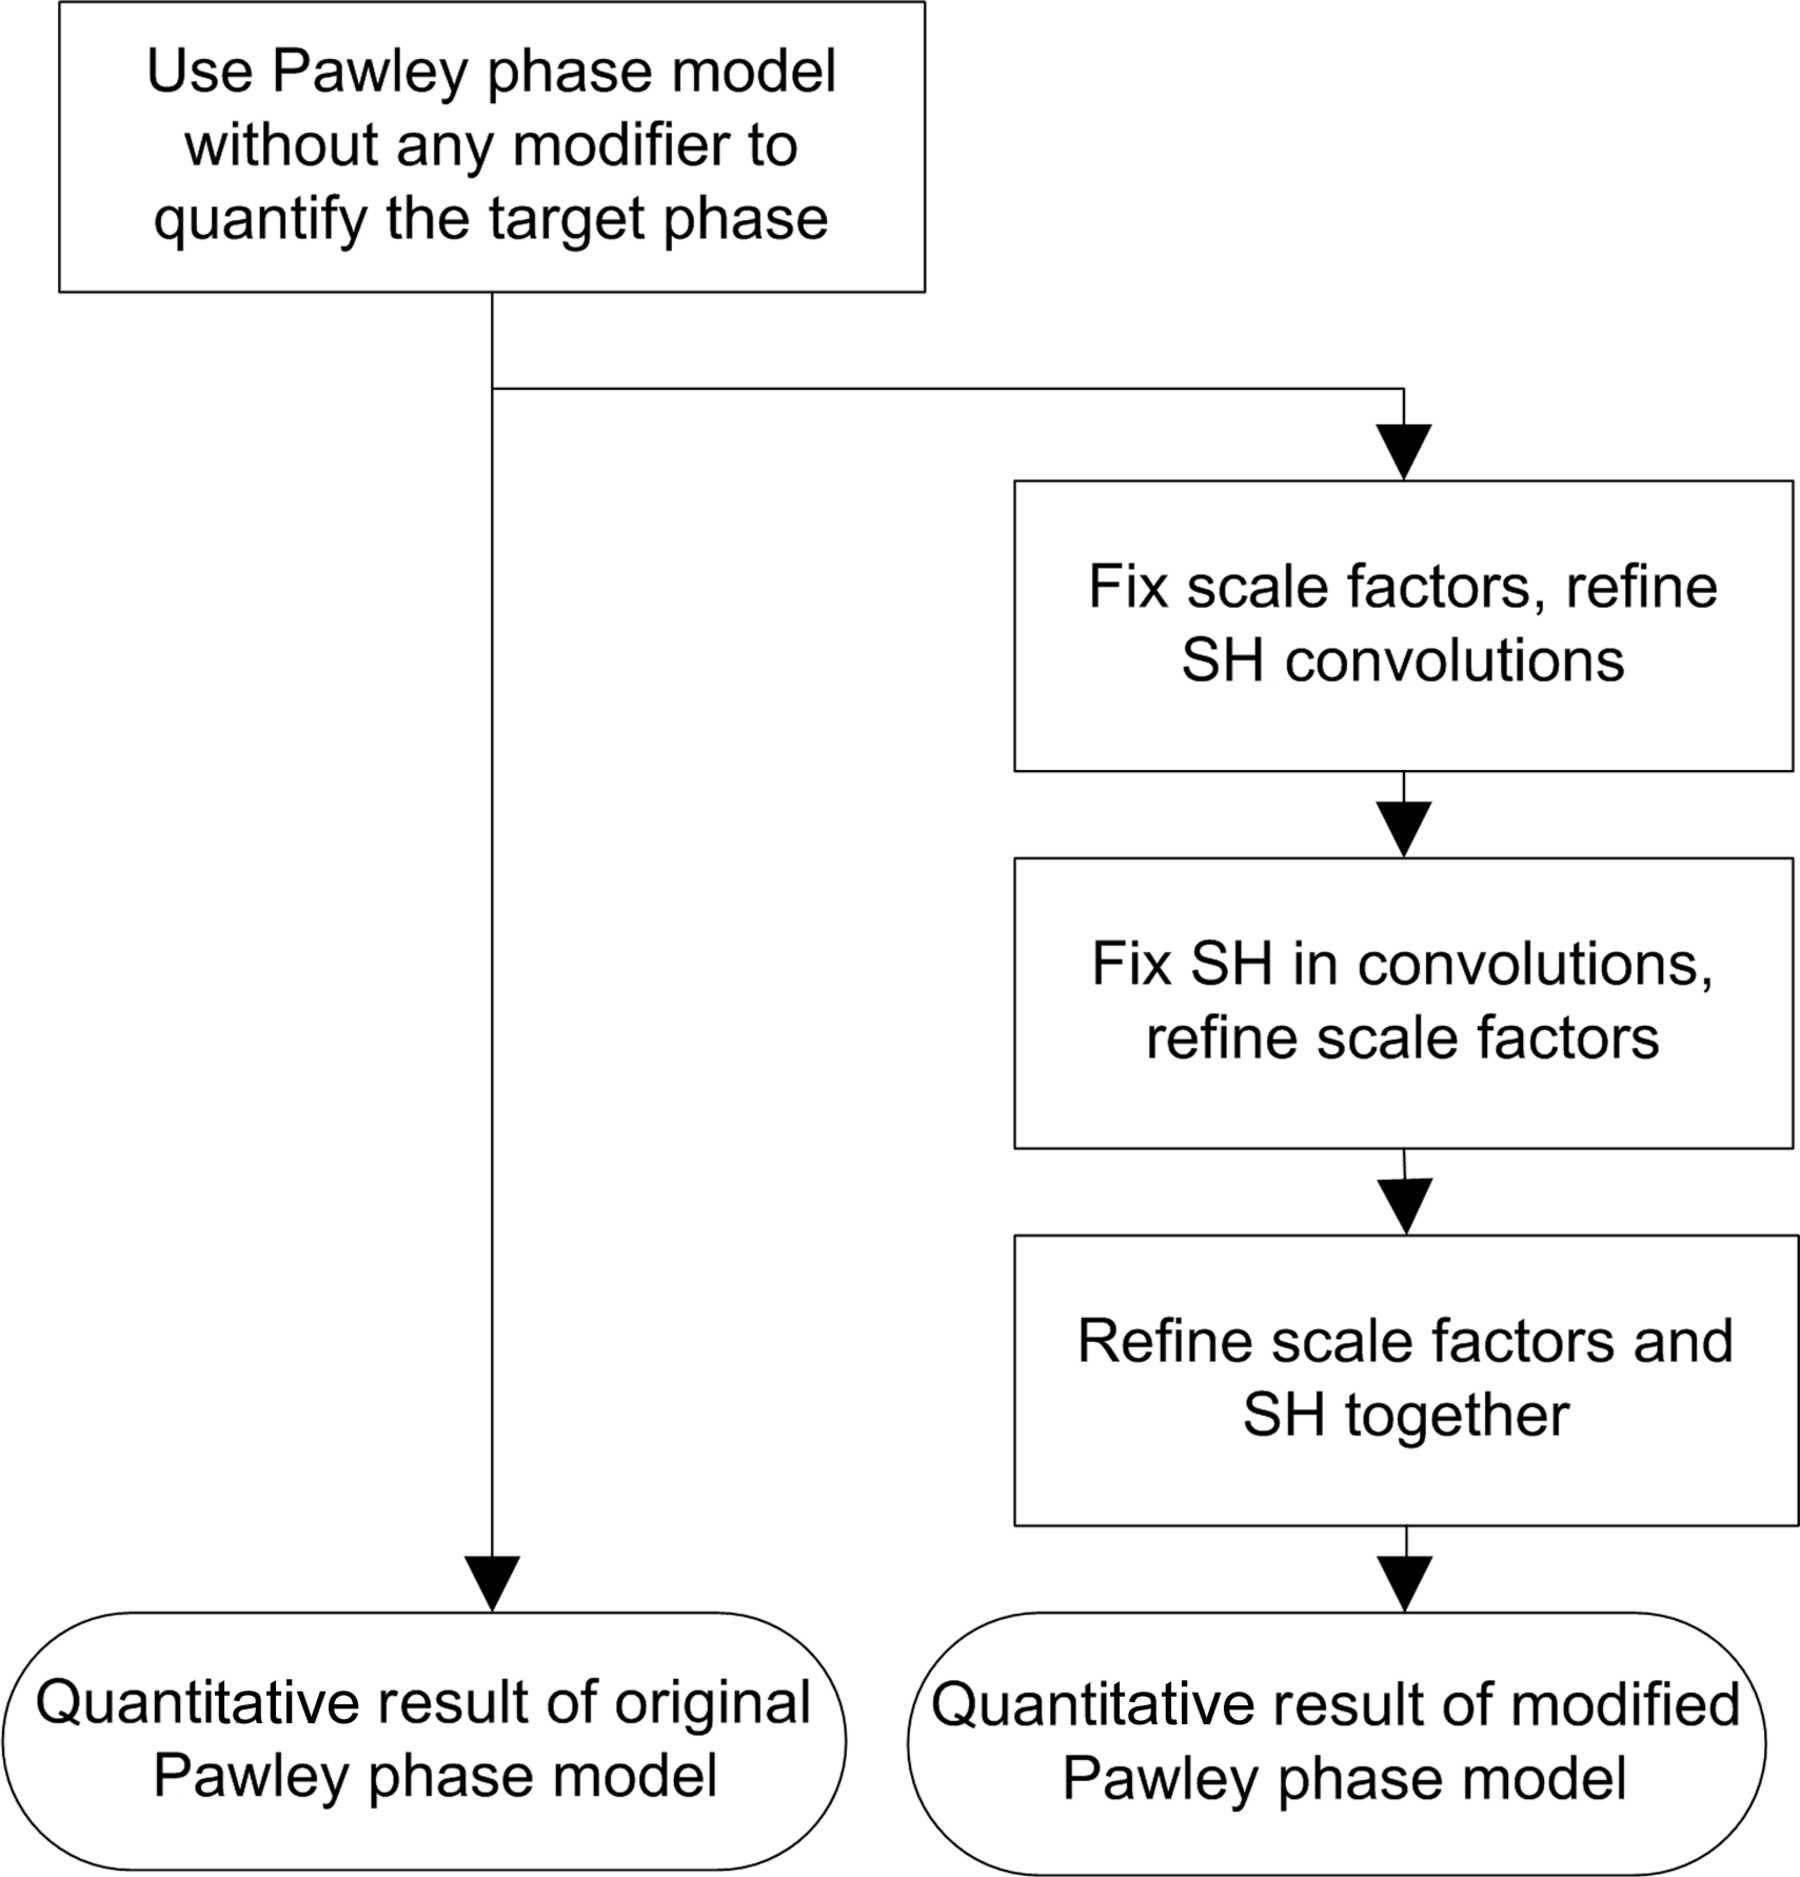 IUCr) Quantitative X-ray diffraction phase analysis of